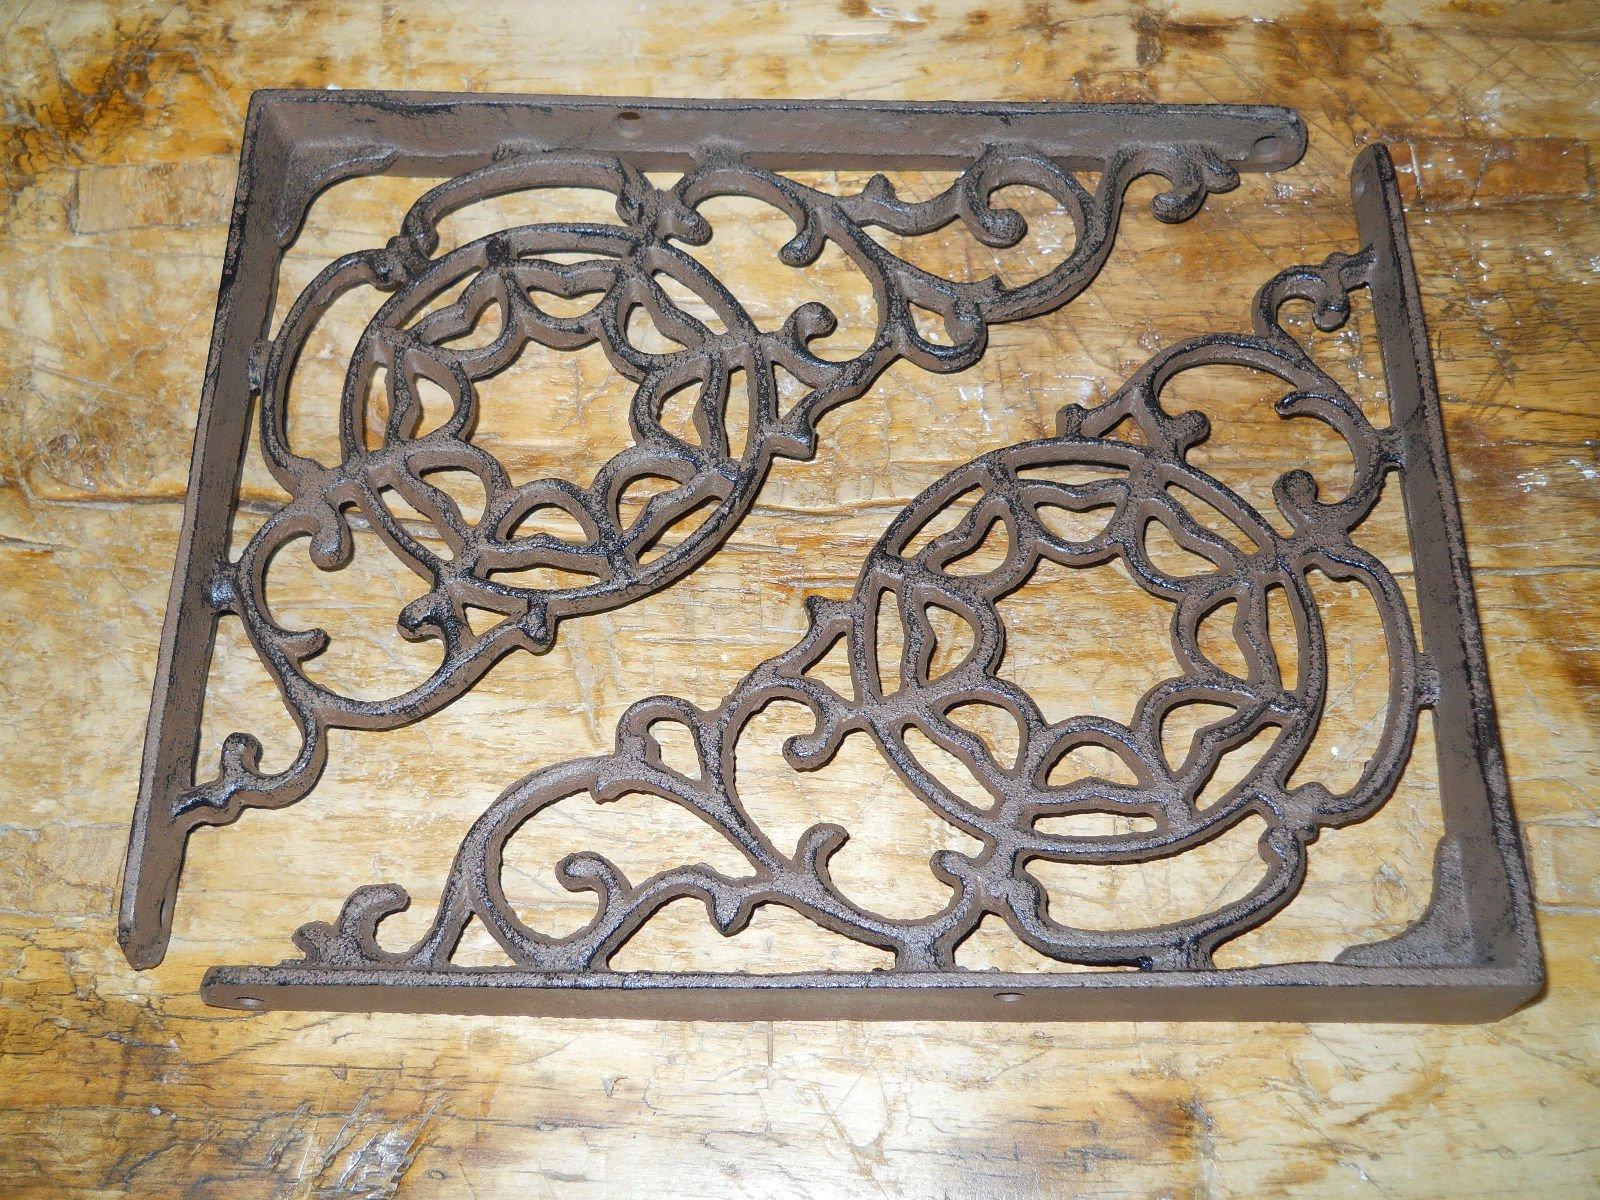 6 Cast Iron Antique Style LARGE WEB Brackets, Garden Braces Shelf Bracket , Garden Braces Shelf Bracket , Garden Braces Shelf Bracket RUSTIC , Wall Brackets Shelf Support for Storage